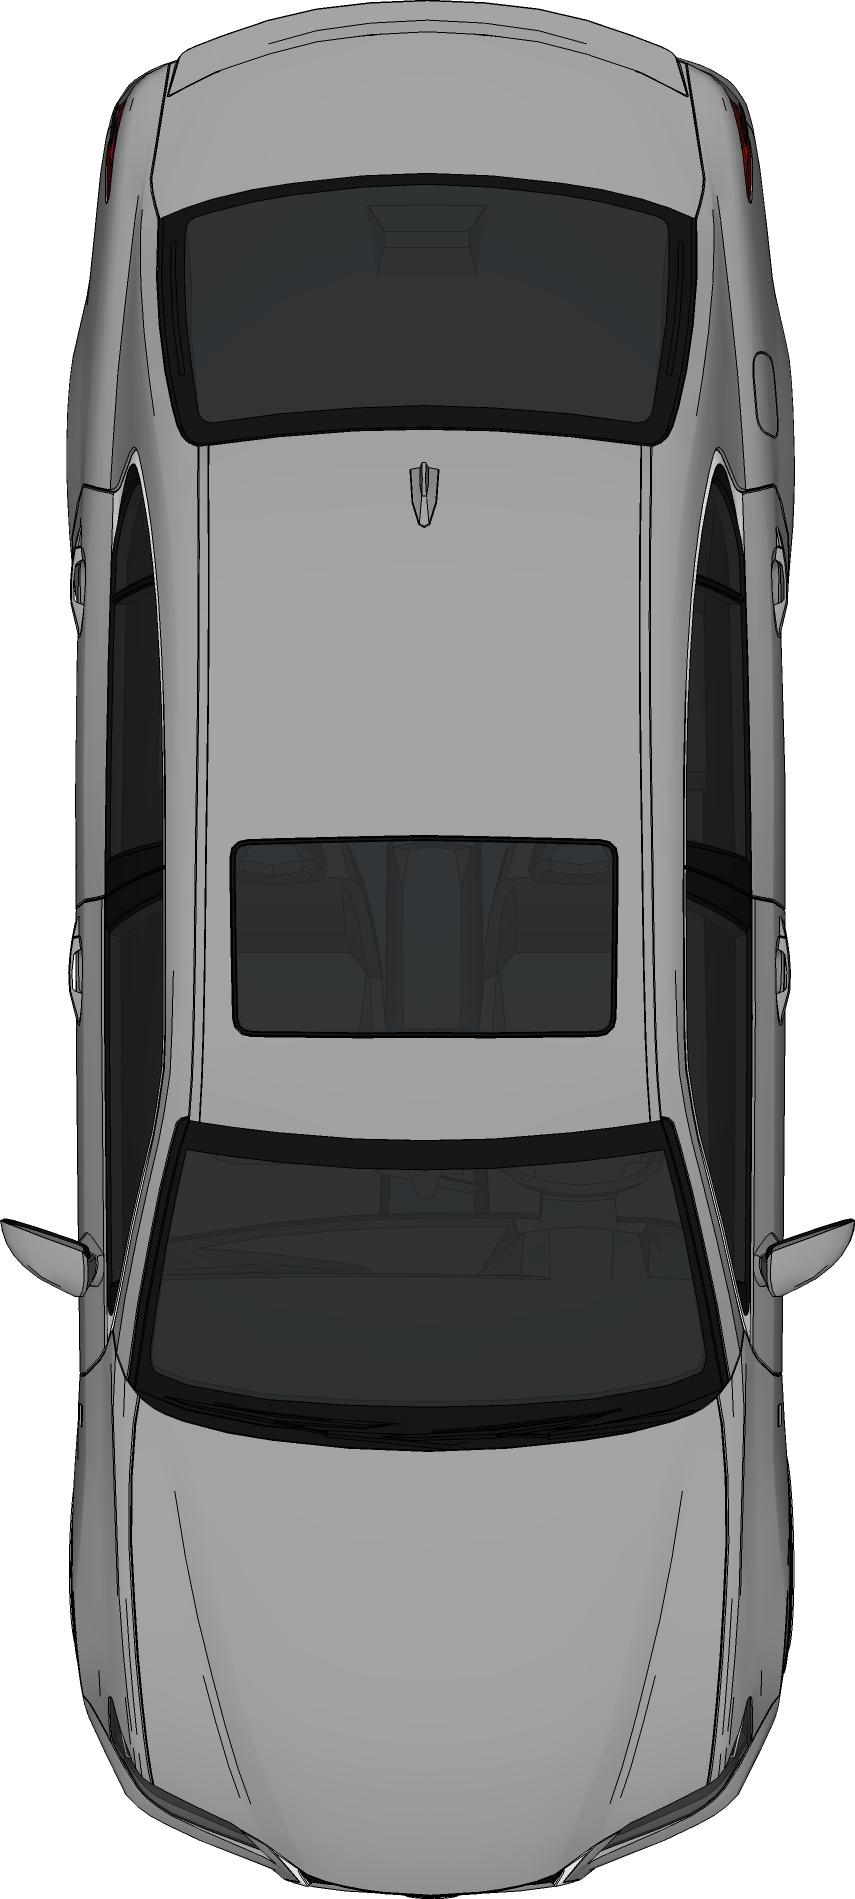 Car clip art bed. Door clipart top view